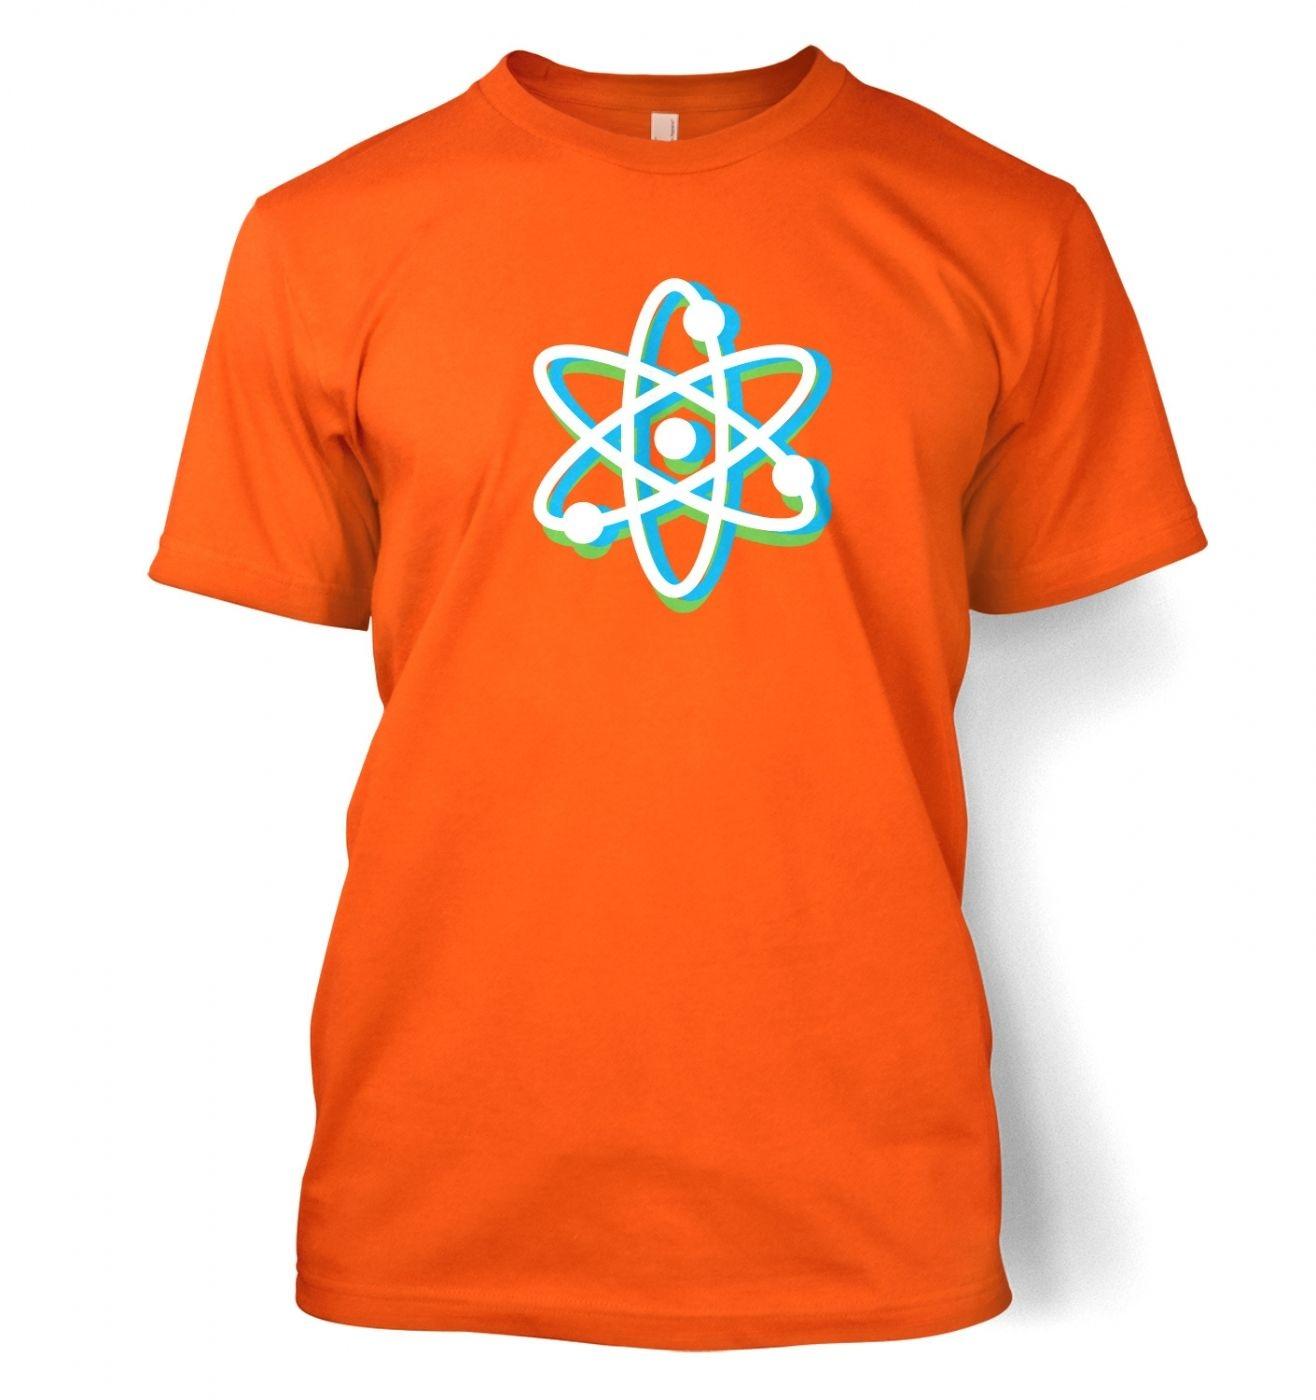 Atom men's t-shirt